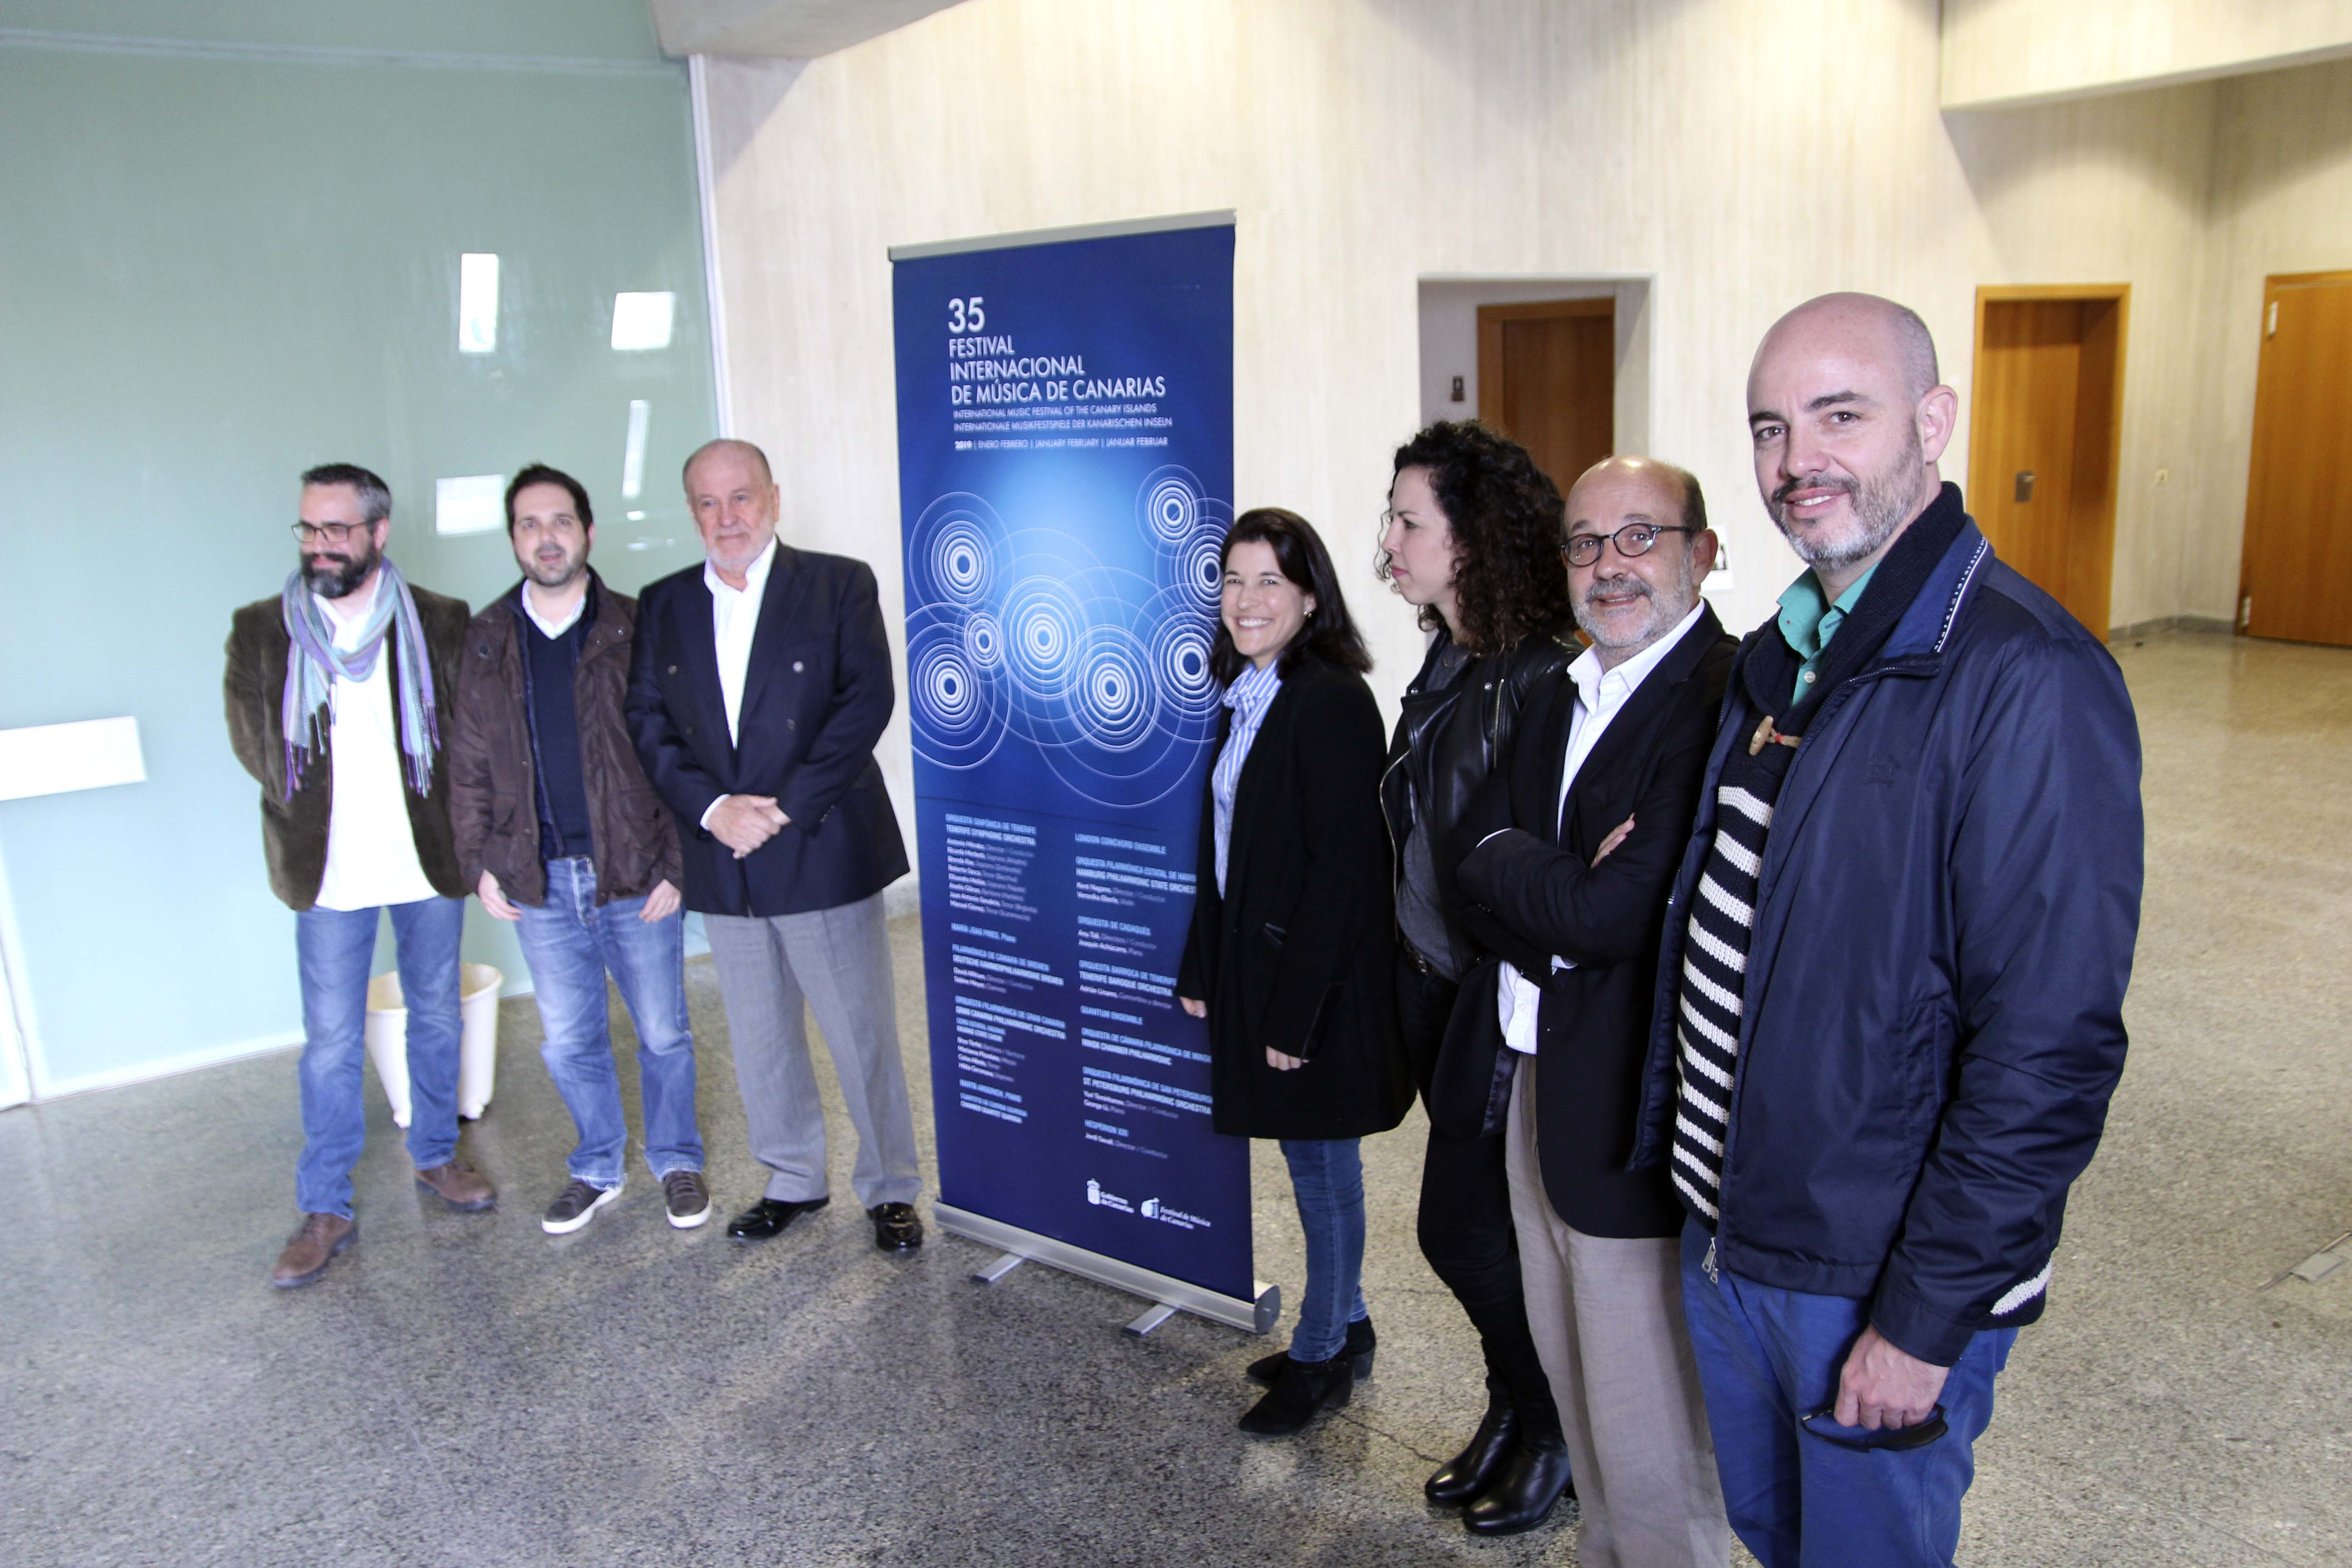 Martha Argerich vuelve a Canarias junto con el Cuarteto Quiroga